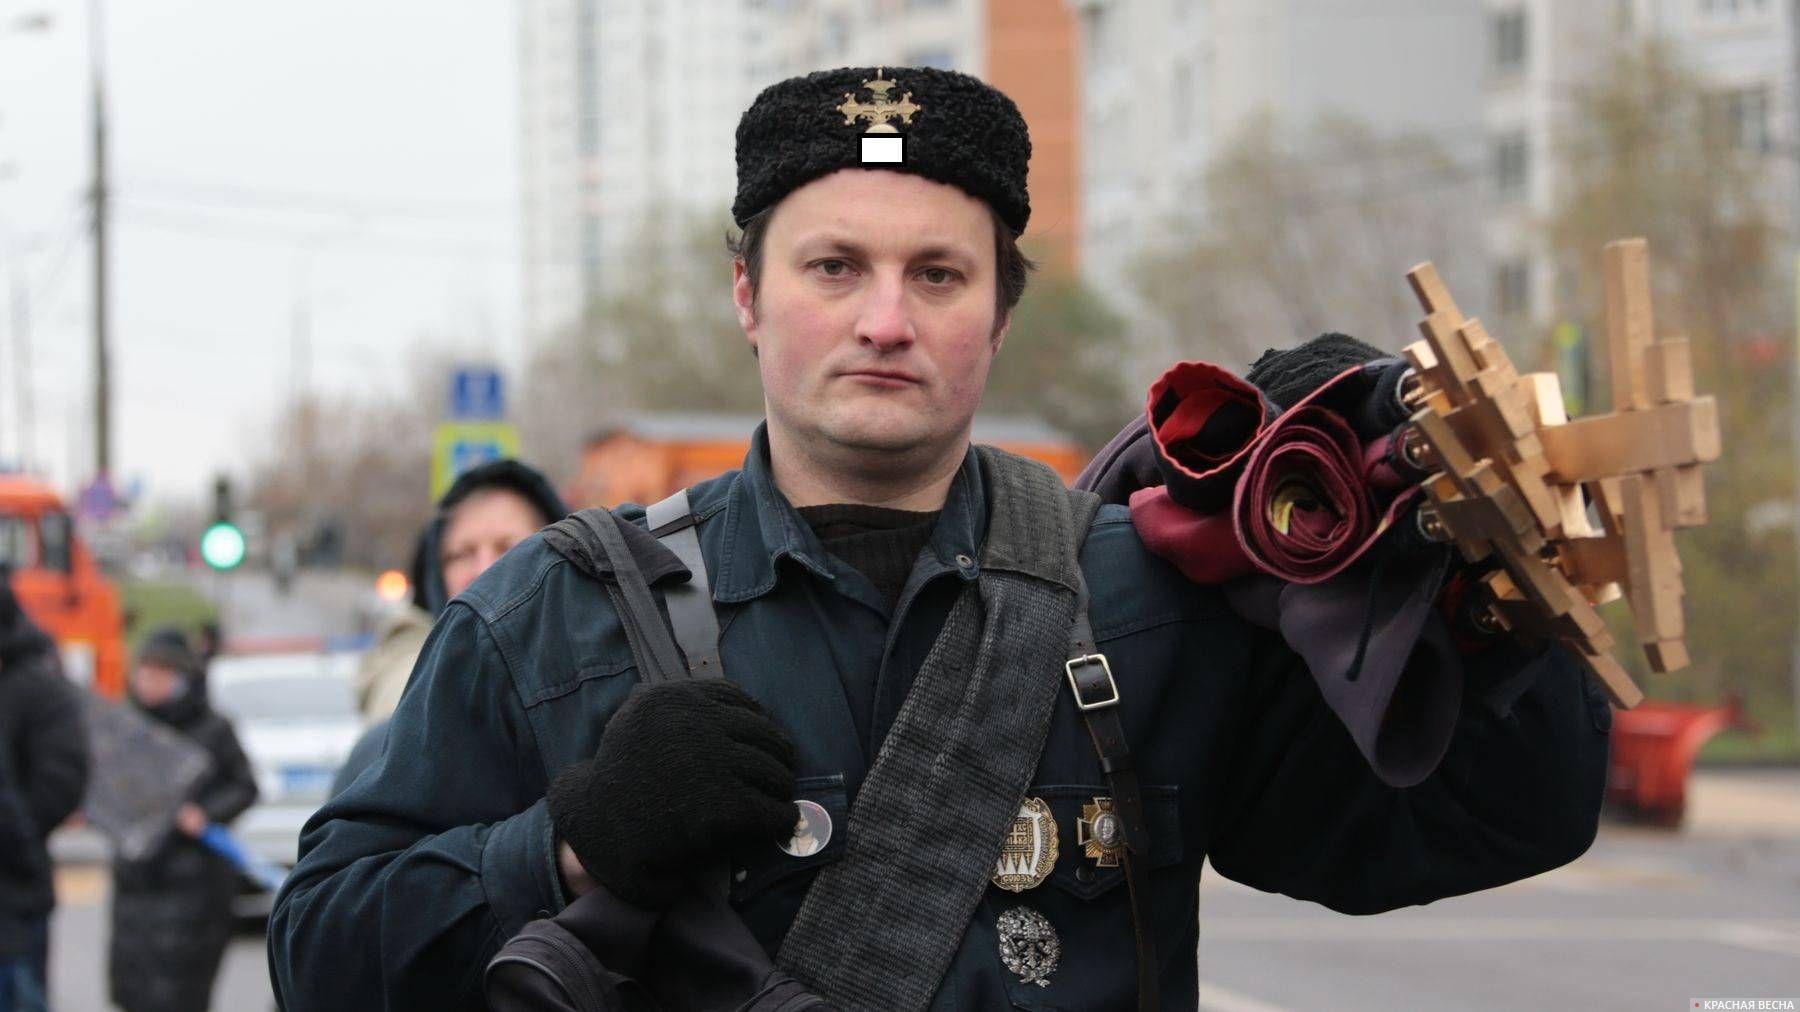 Хоругвеносец Русский марш Люблино 2019